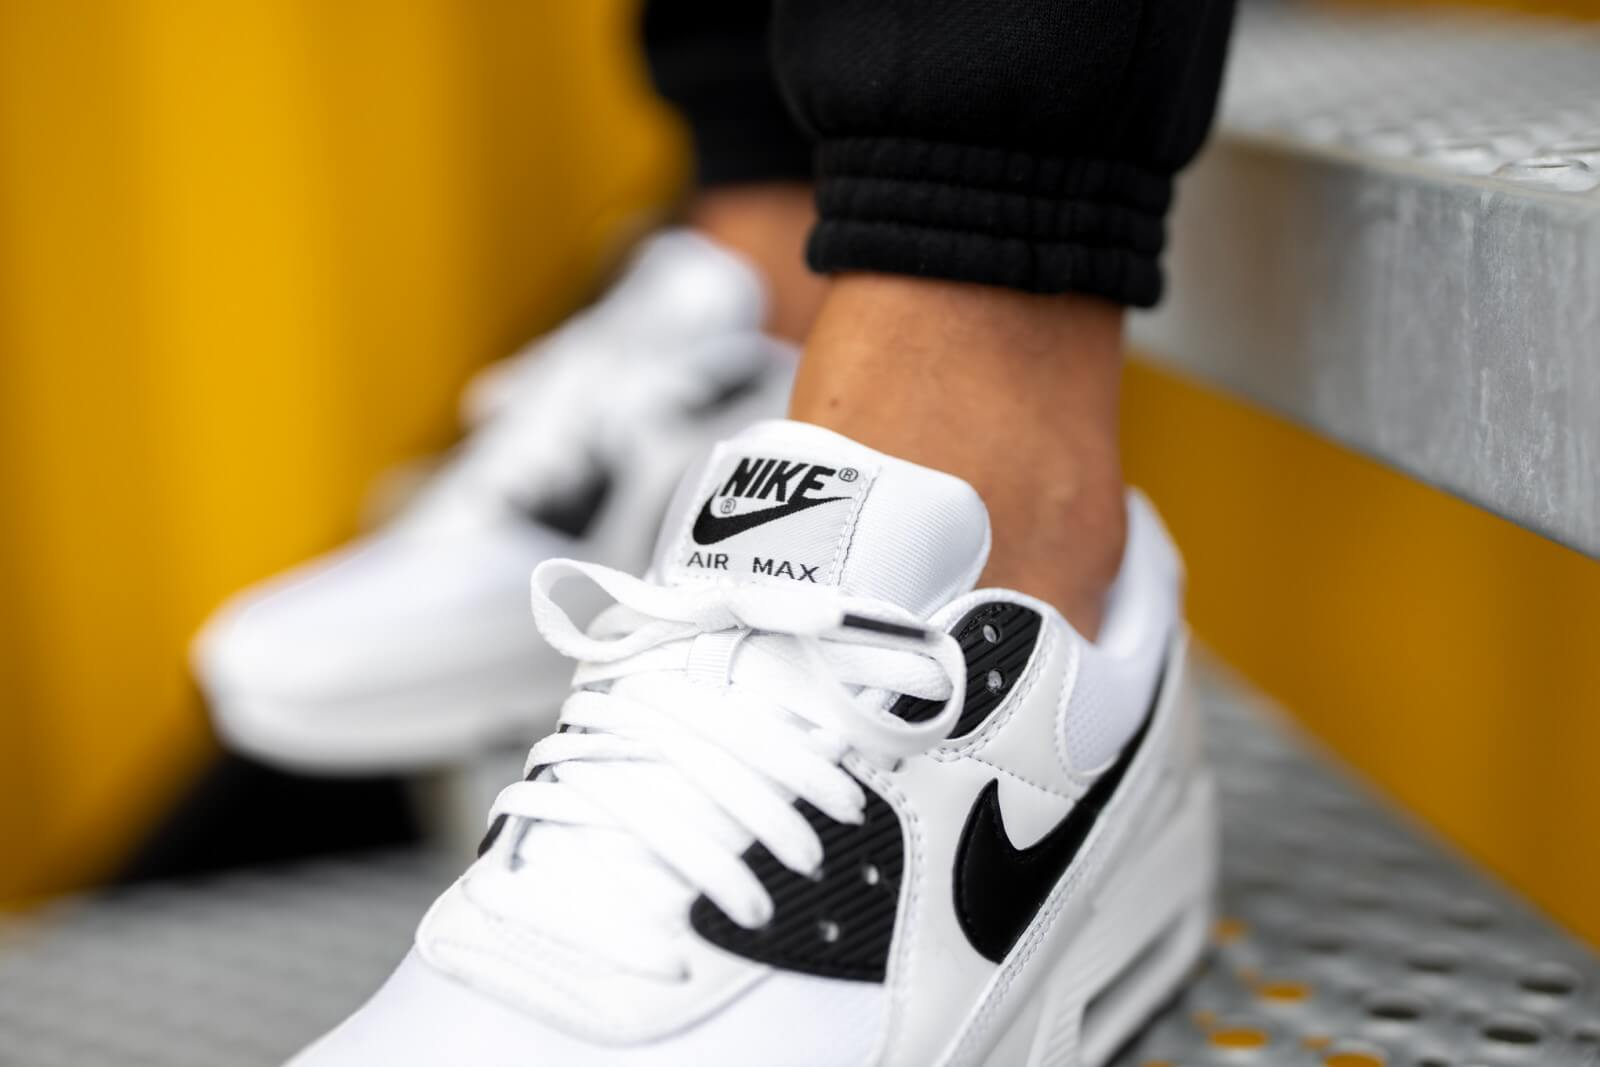 Nike Air Max 90 White/Black